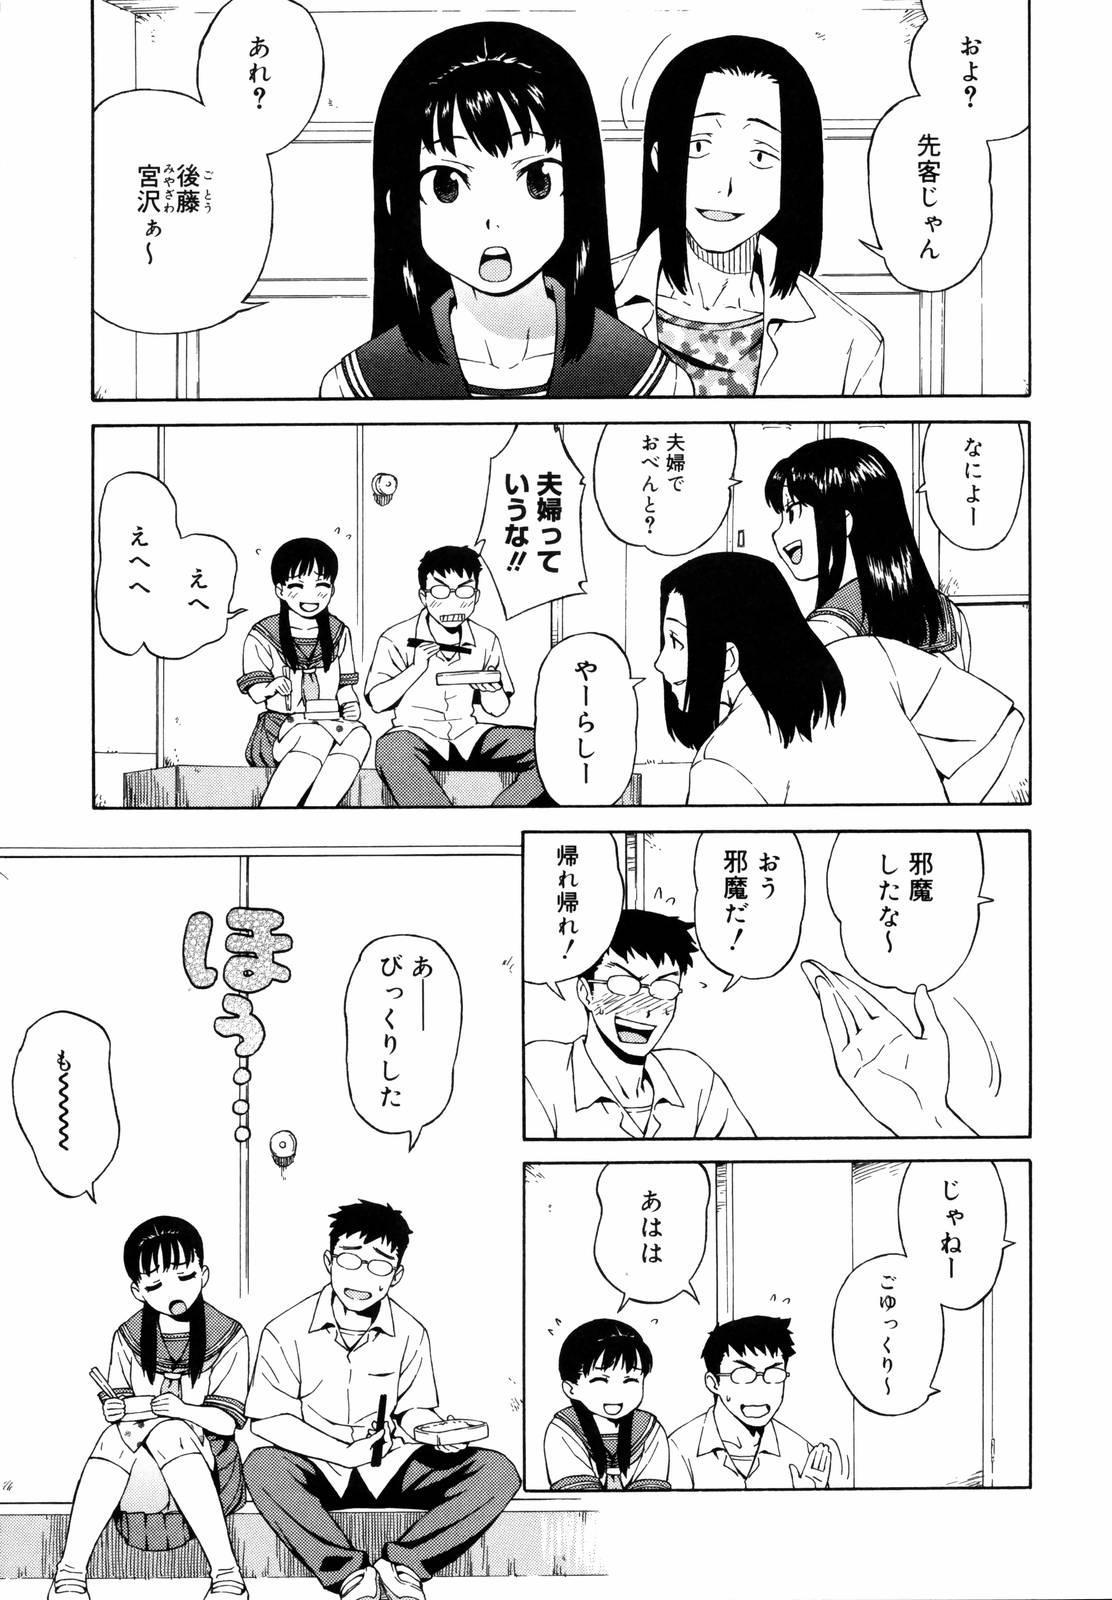 Shishunki wa Hatsujouki - Adolescence is a sexual excitement period. 72